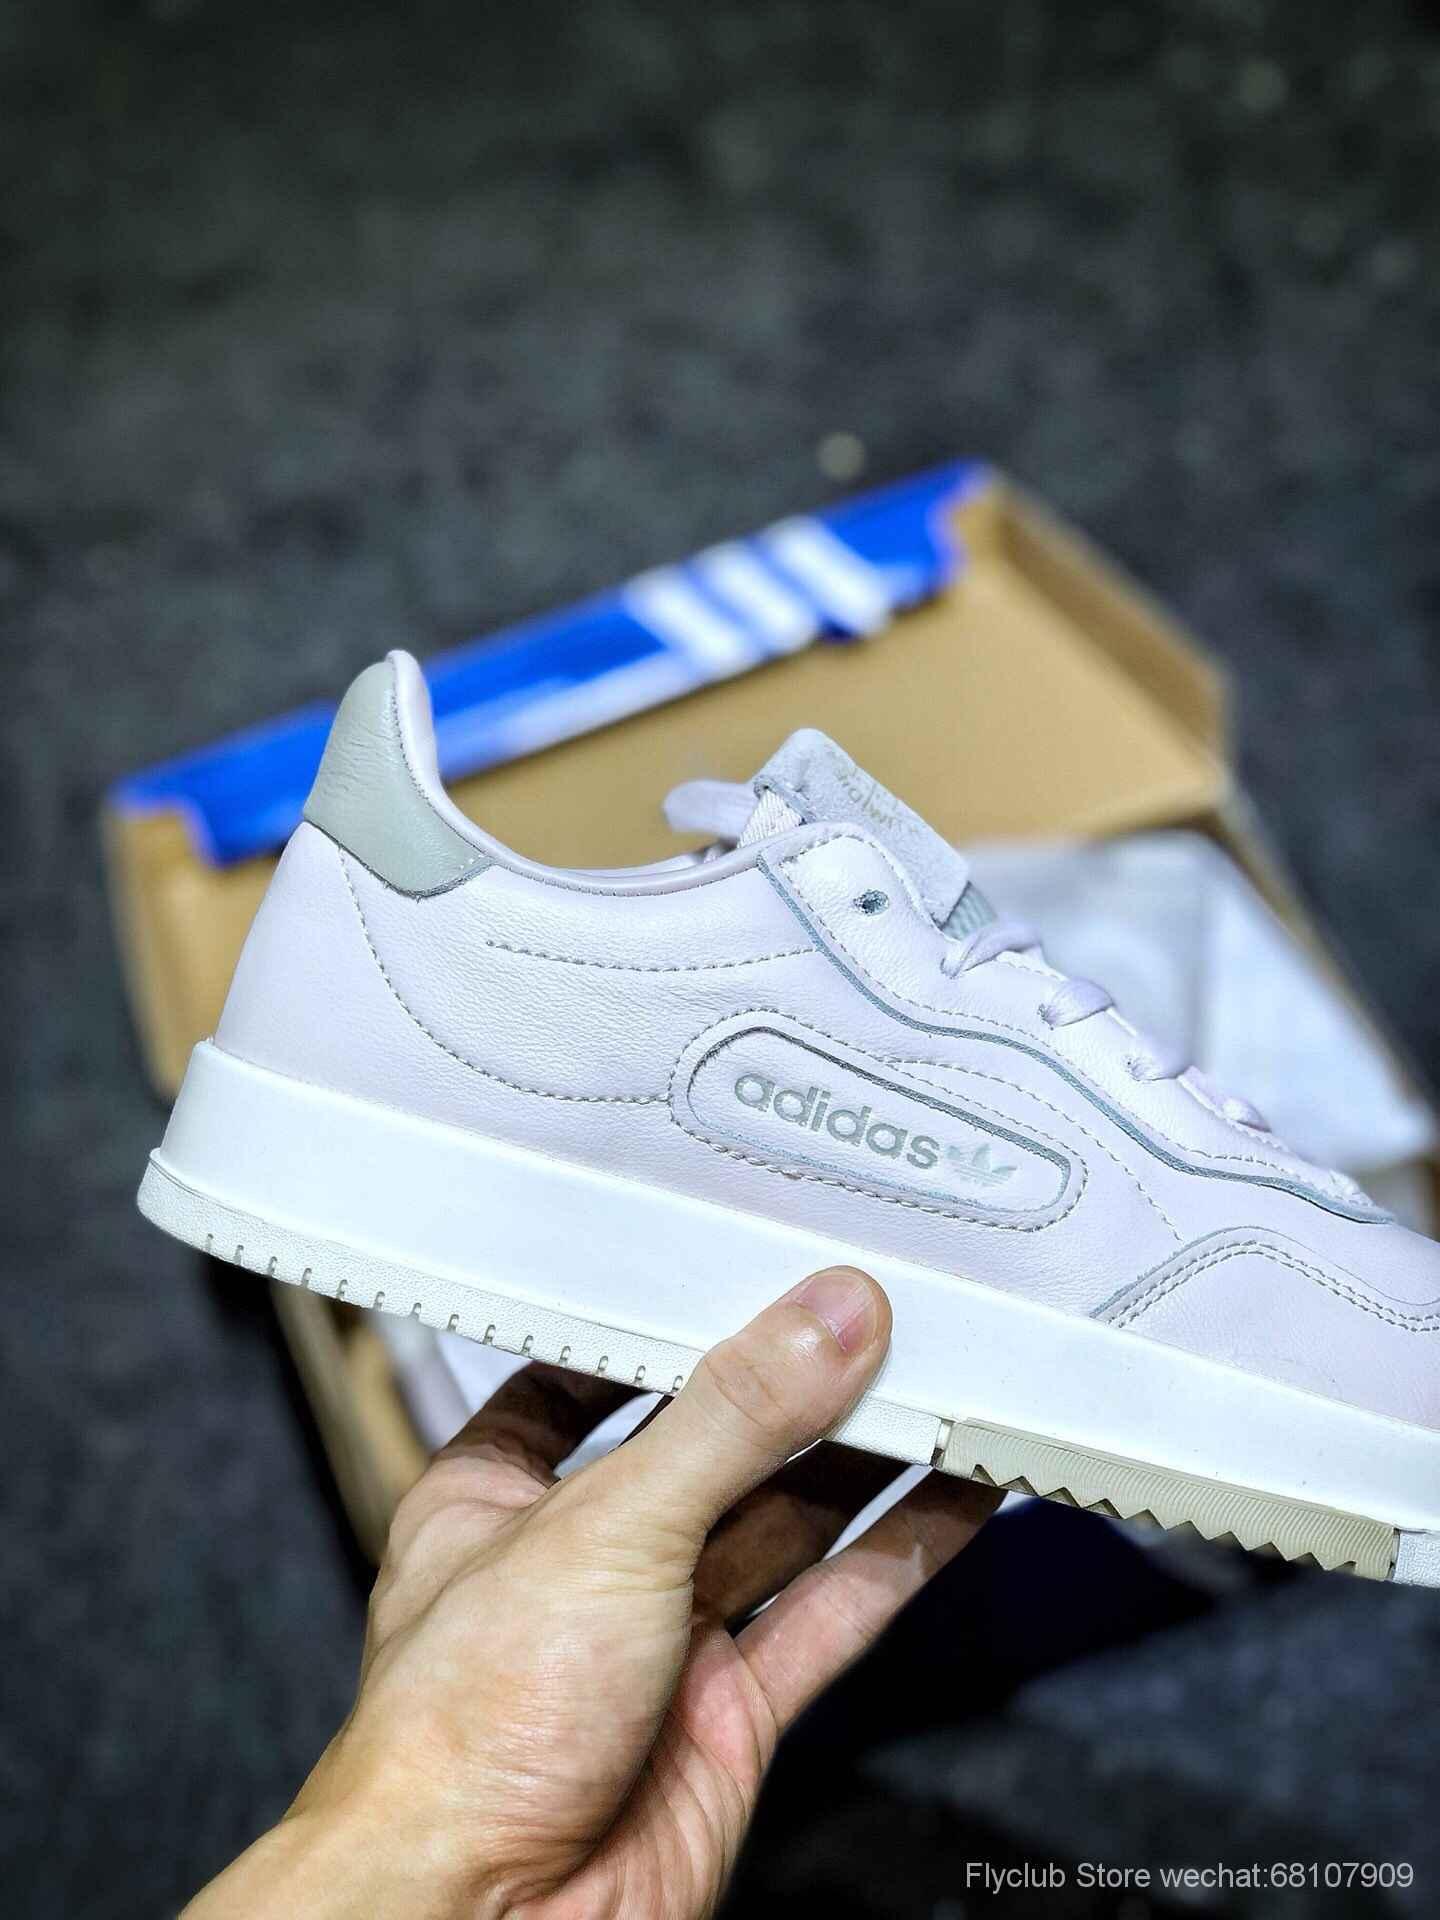 "Adidas SC Premiere""White""三叶草历史首秀系列经典复古平底百搭休闲波鞋鞋款以淡紫色为主调"